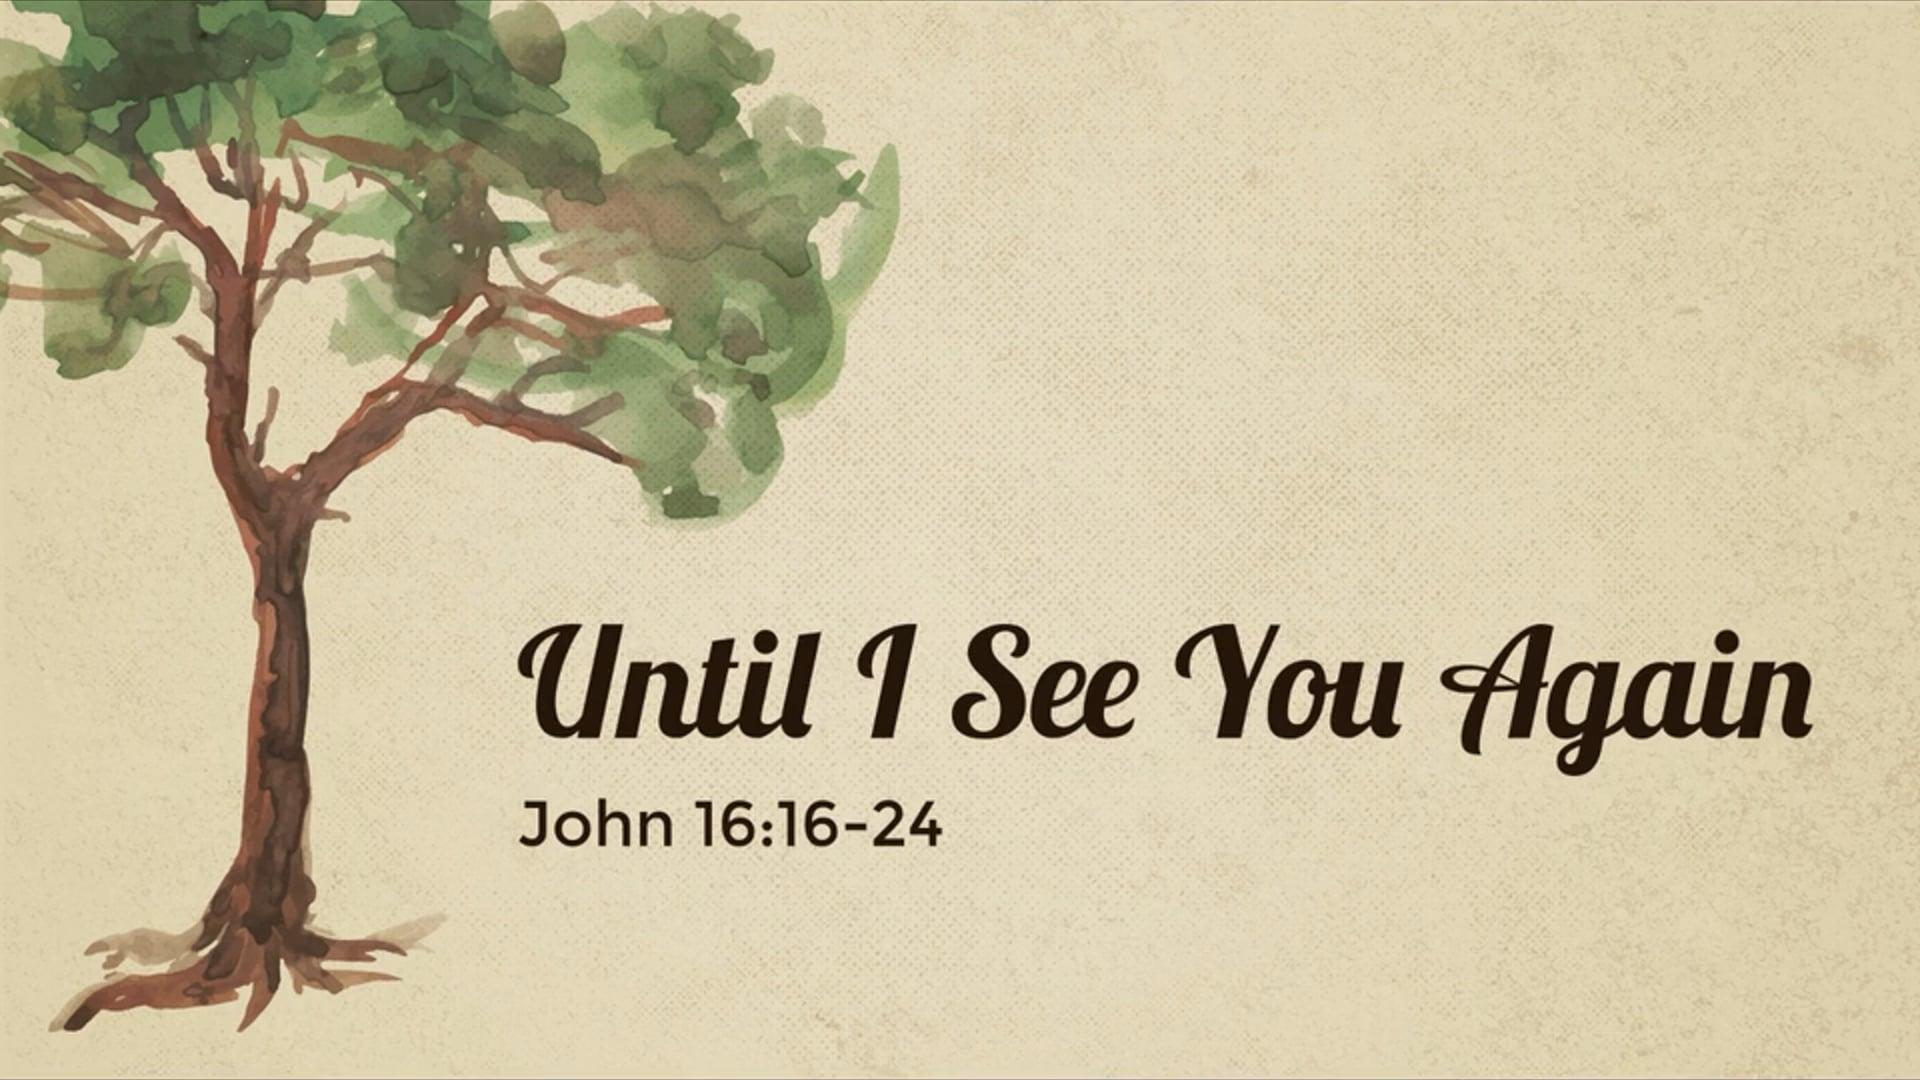 Unitl I See You Again - John 16_16-24